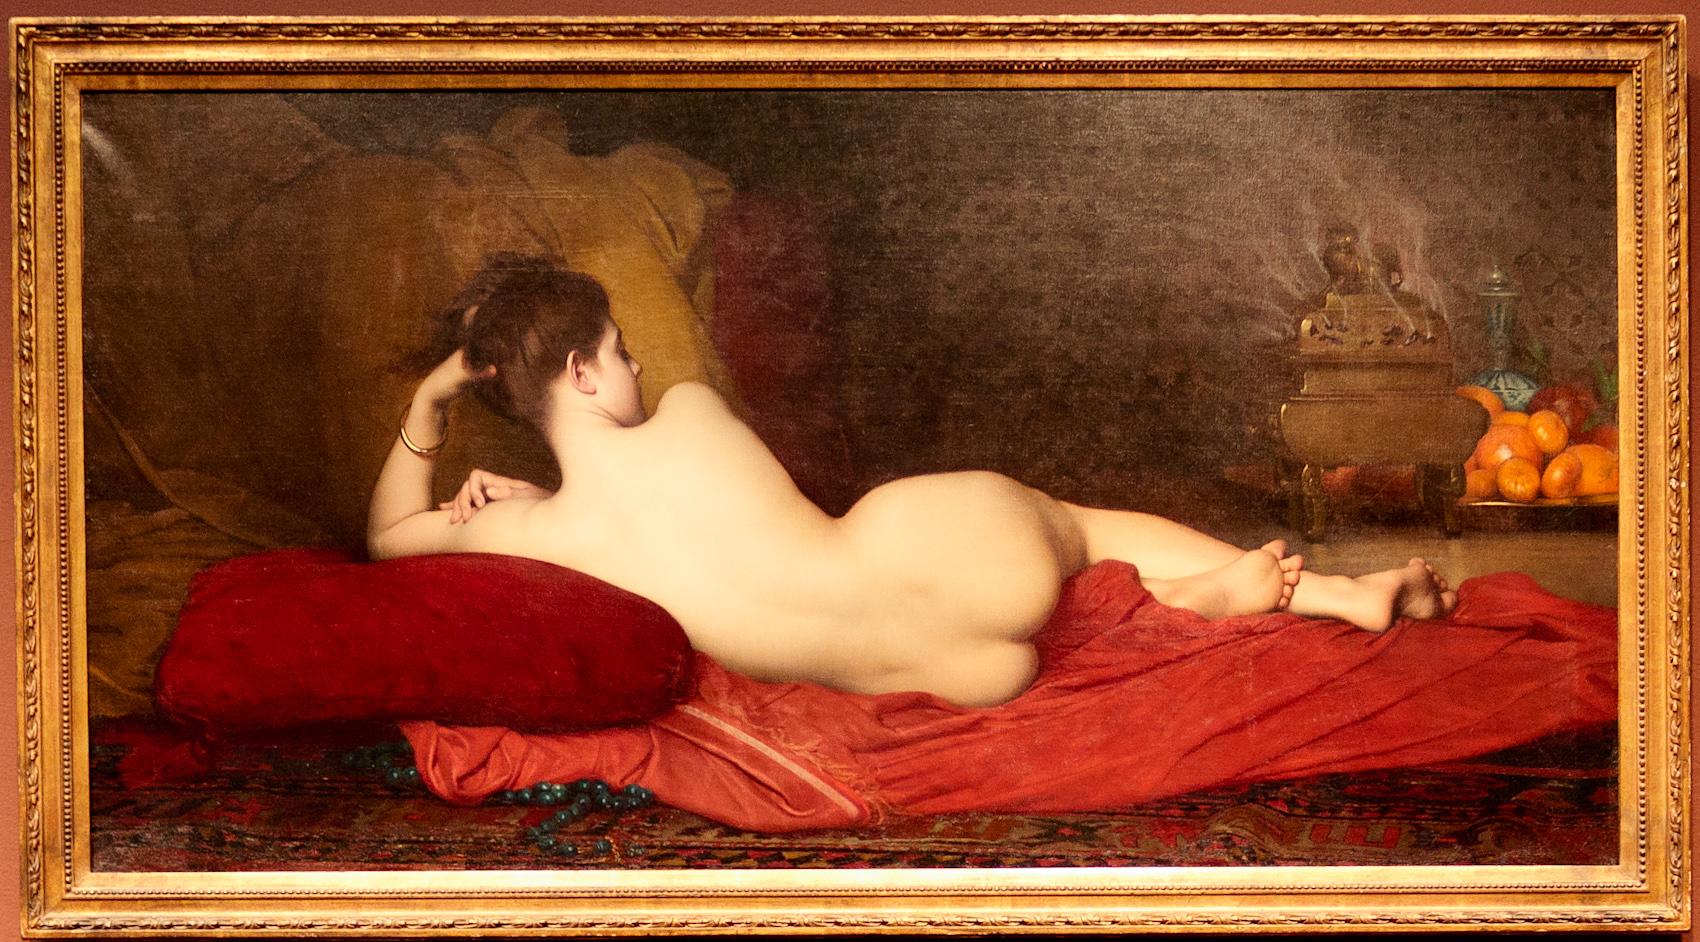 Jules-Joseph Lefebvre, Odalisque, 1874